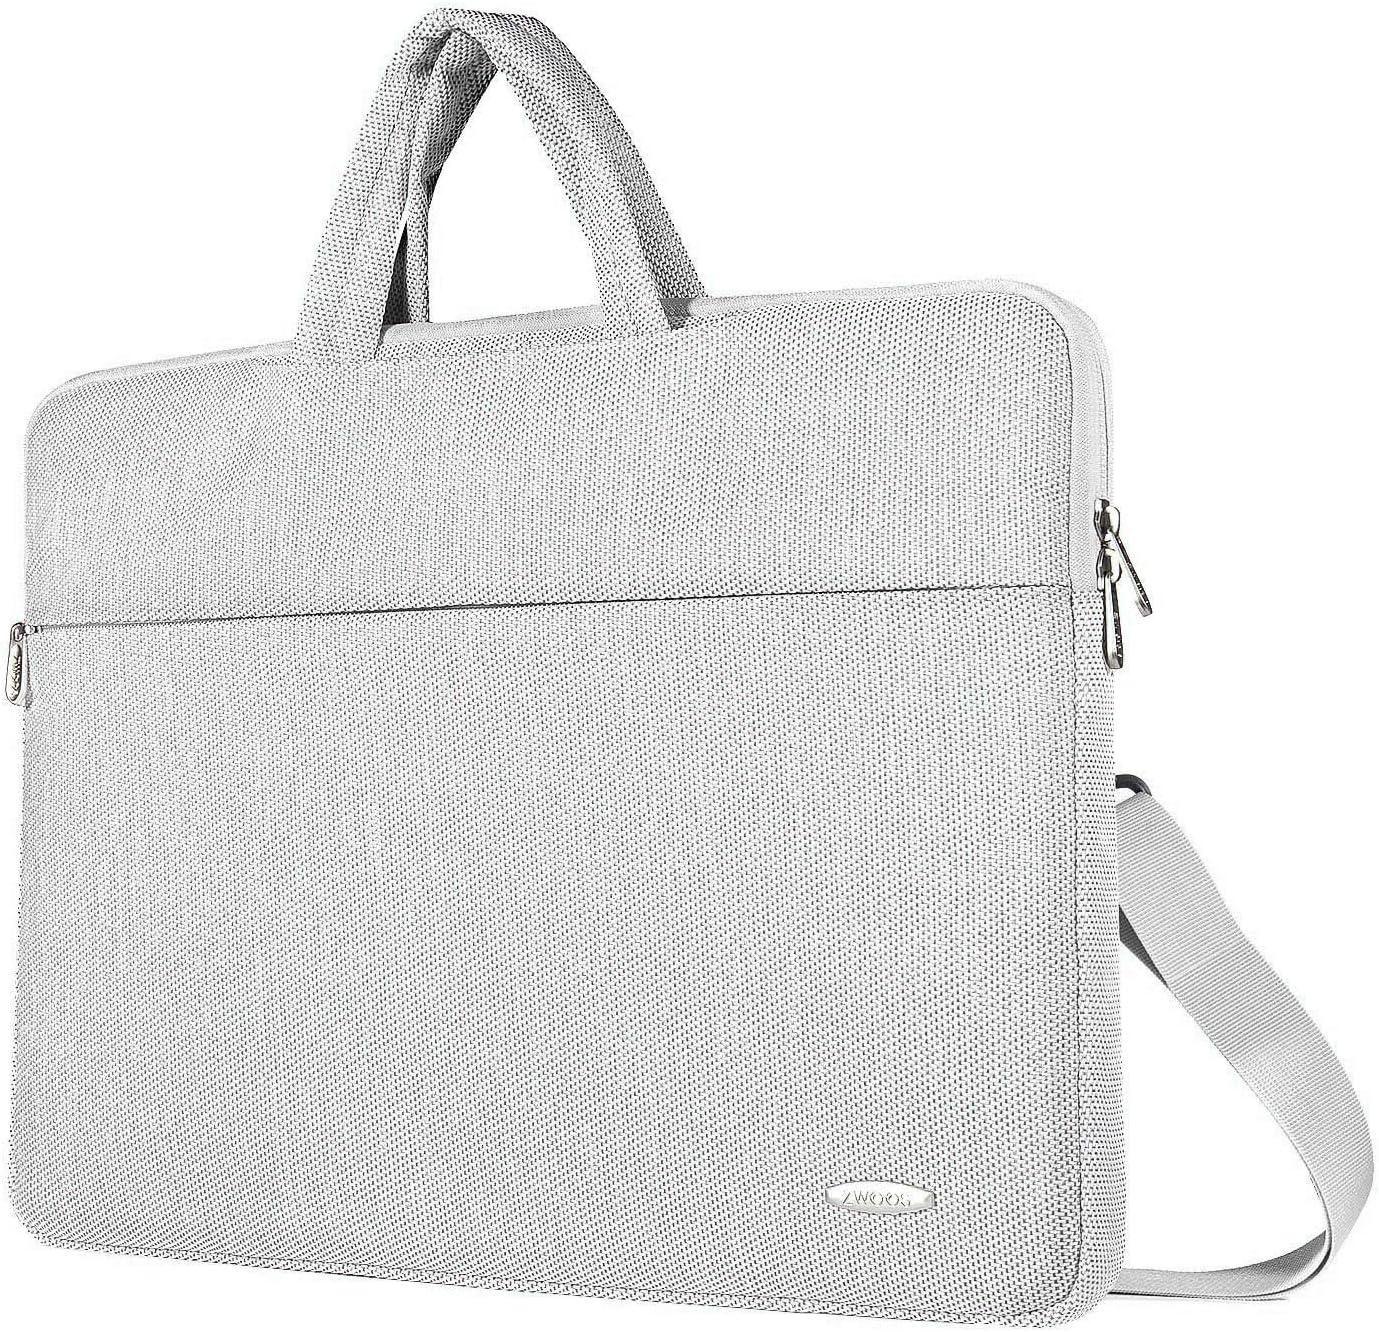 ZWOOS Laptop Case Bag, Water-resistan Protective Laptop Shoulder Carrying Case With Shoulder Strap and Handle for 12 12.9 13 inch Lenovo Acer Asus Dell Lenovo Hp Samsung Ultrabook, Grey